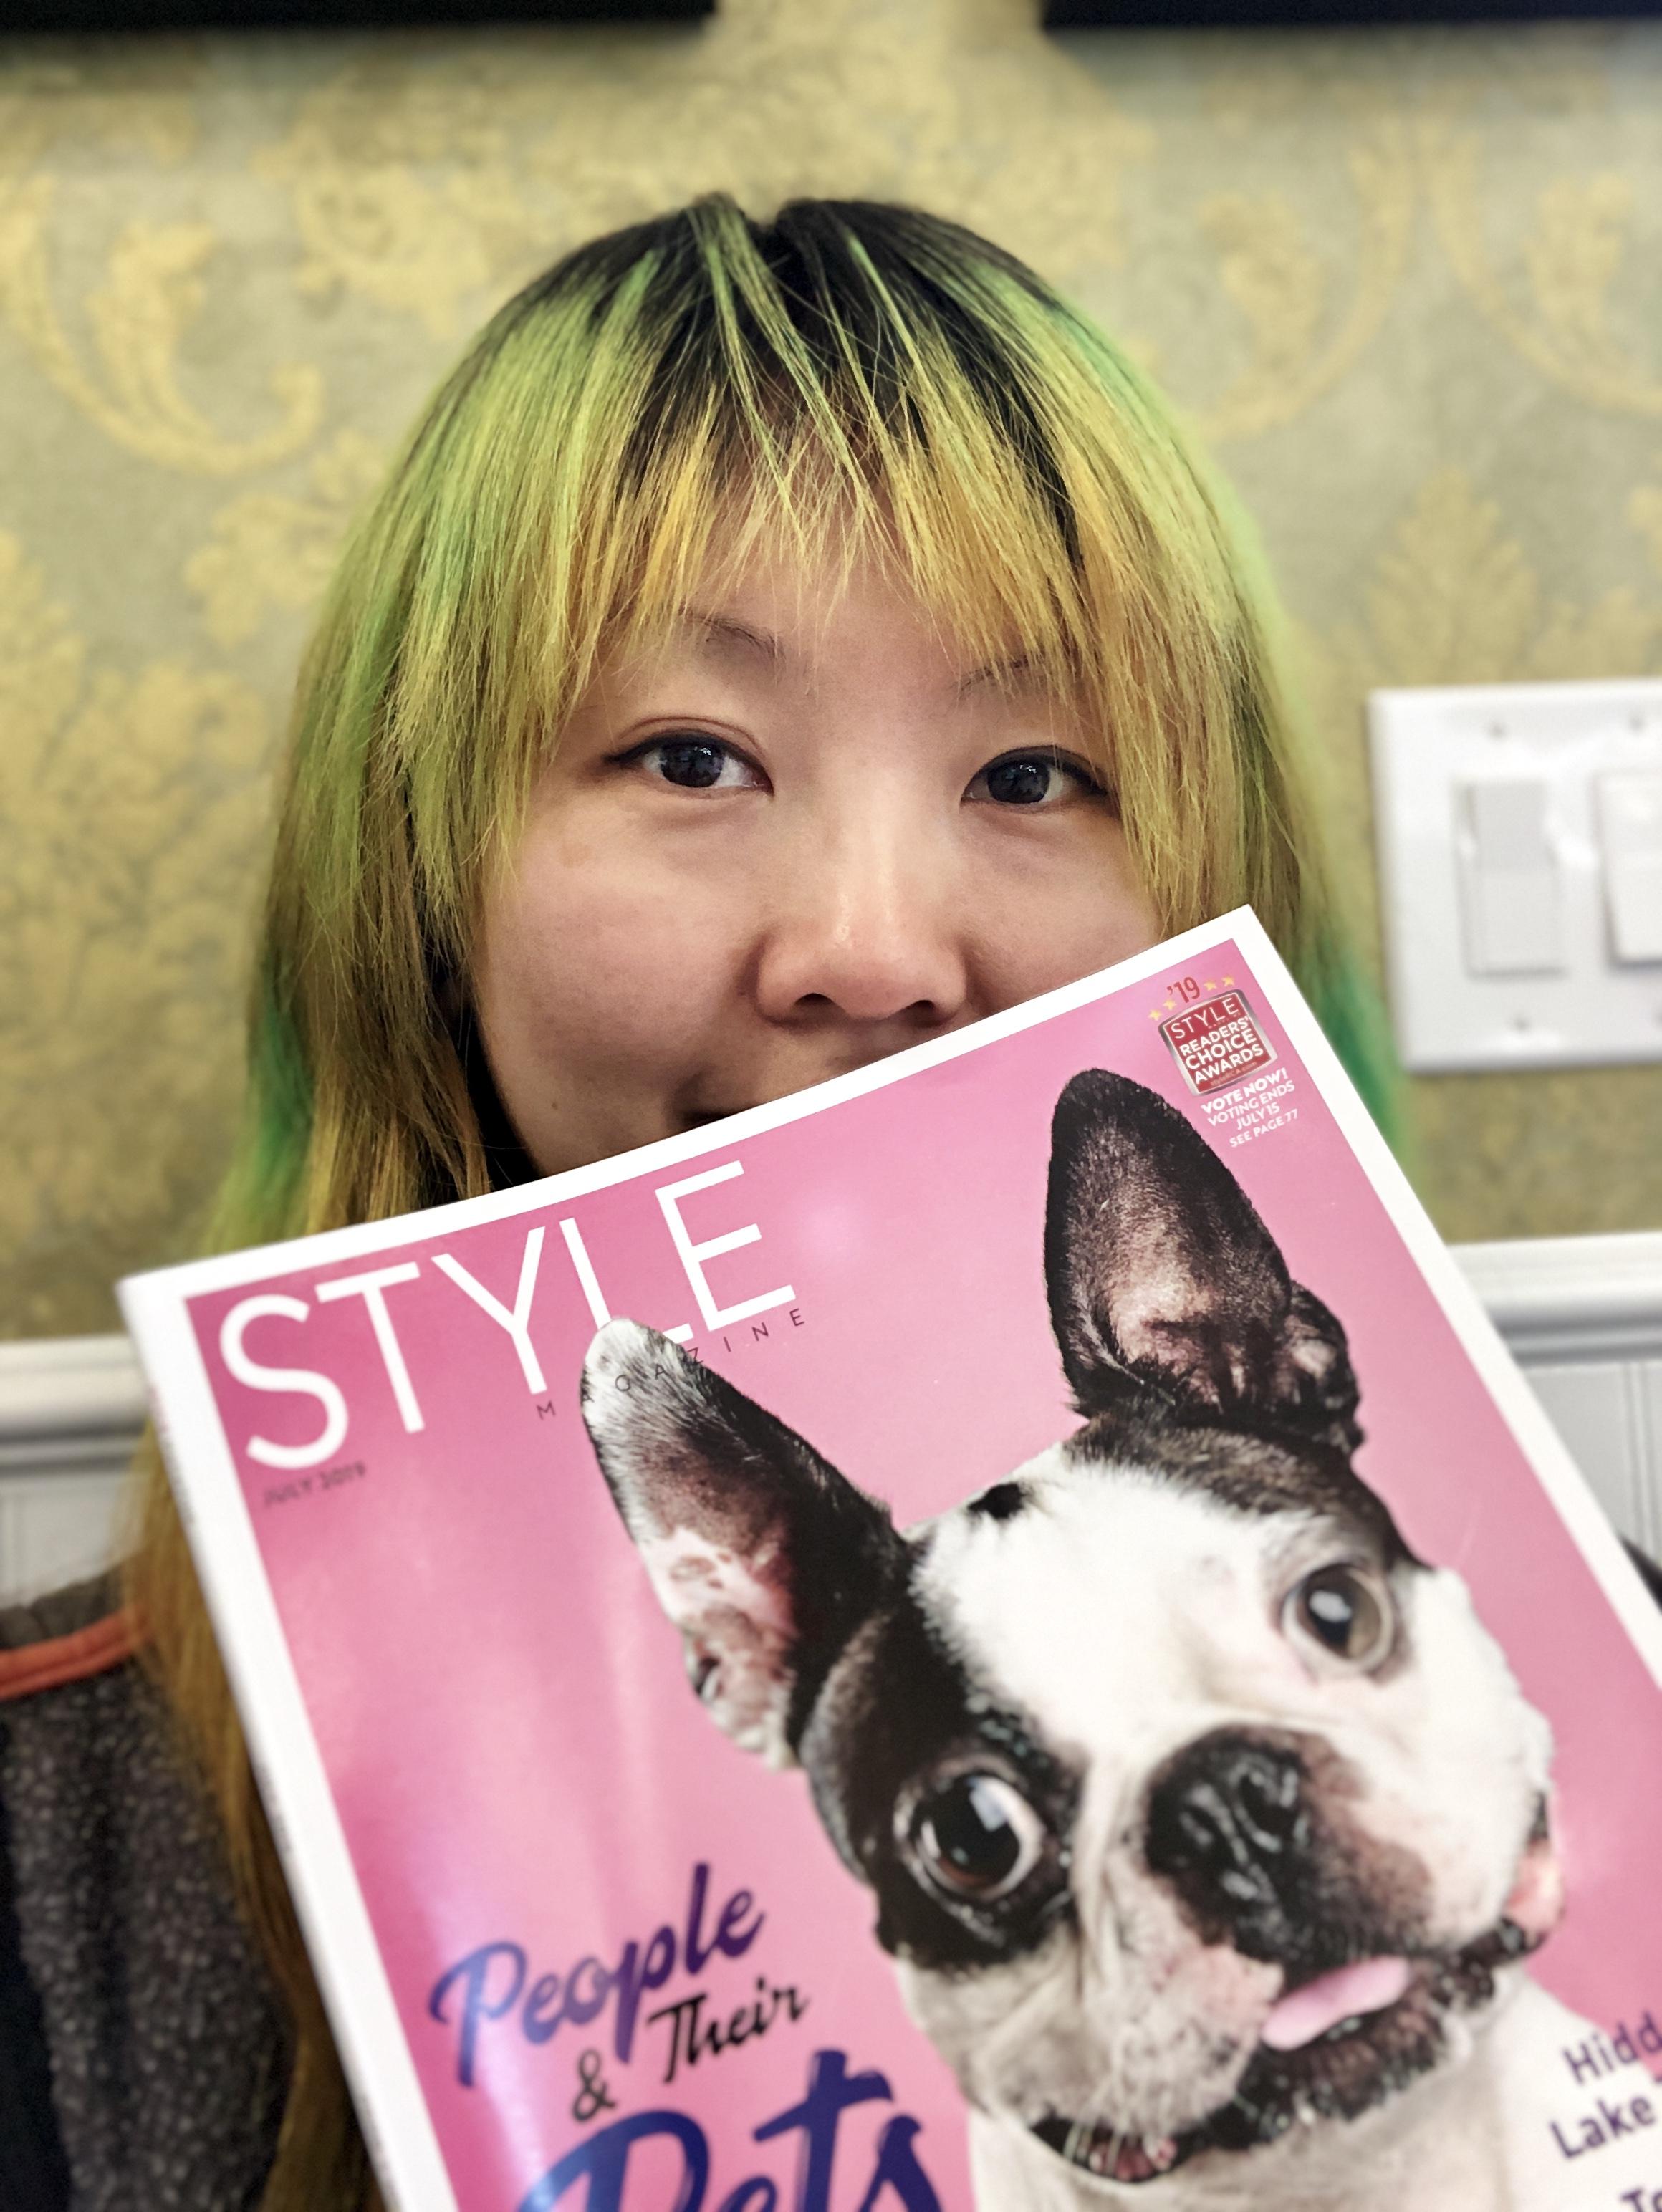 style-magzine.